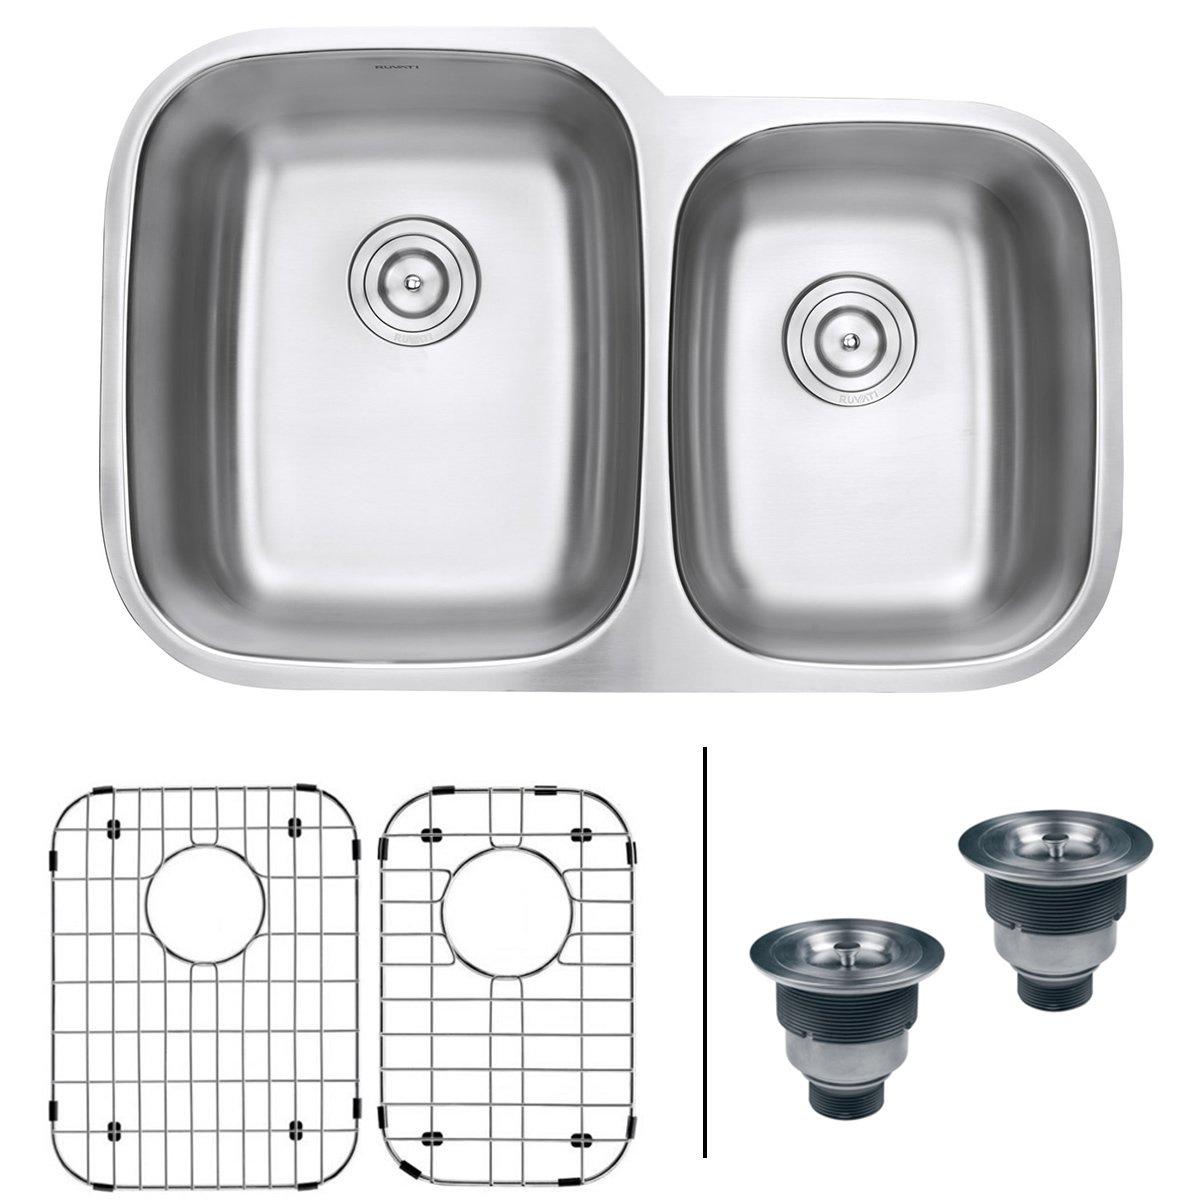 Ruvati 32-inch Undermount 60/40 Double Bowl 16 Gauge Stainless Steel Kitchen Sink - RVM4310 by Ruvati (Image #1)